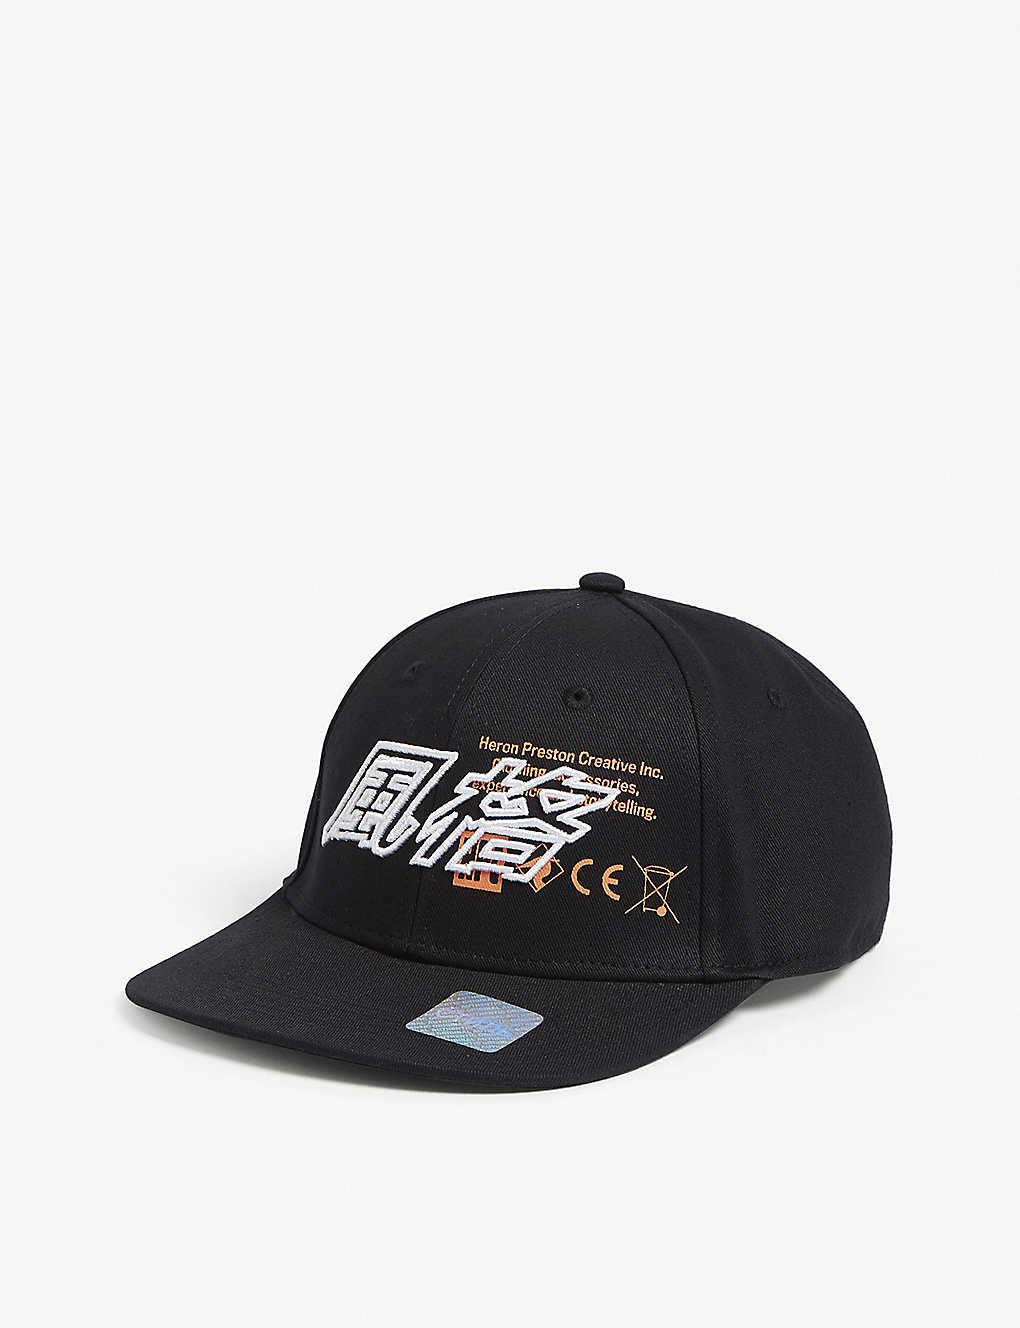 d2cce9a2c756b HERON PRESTON - Chinese logo racing cap